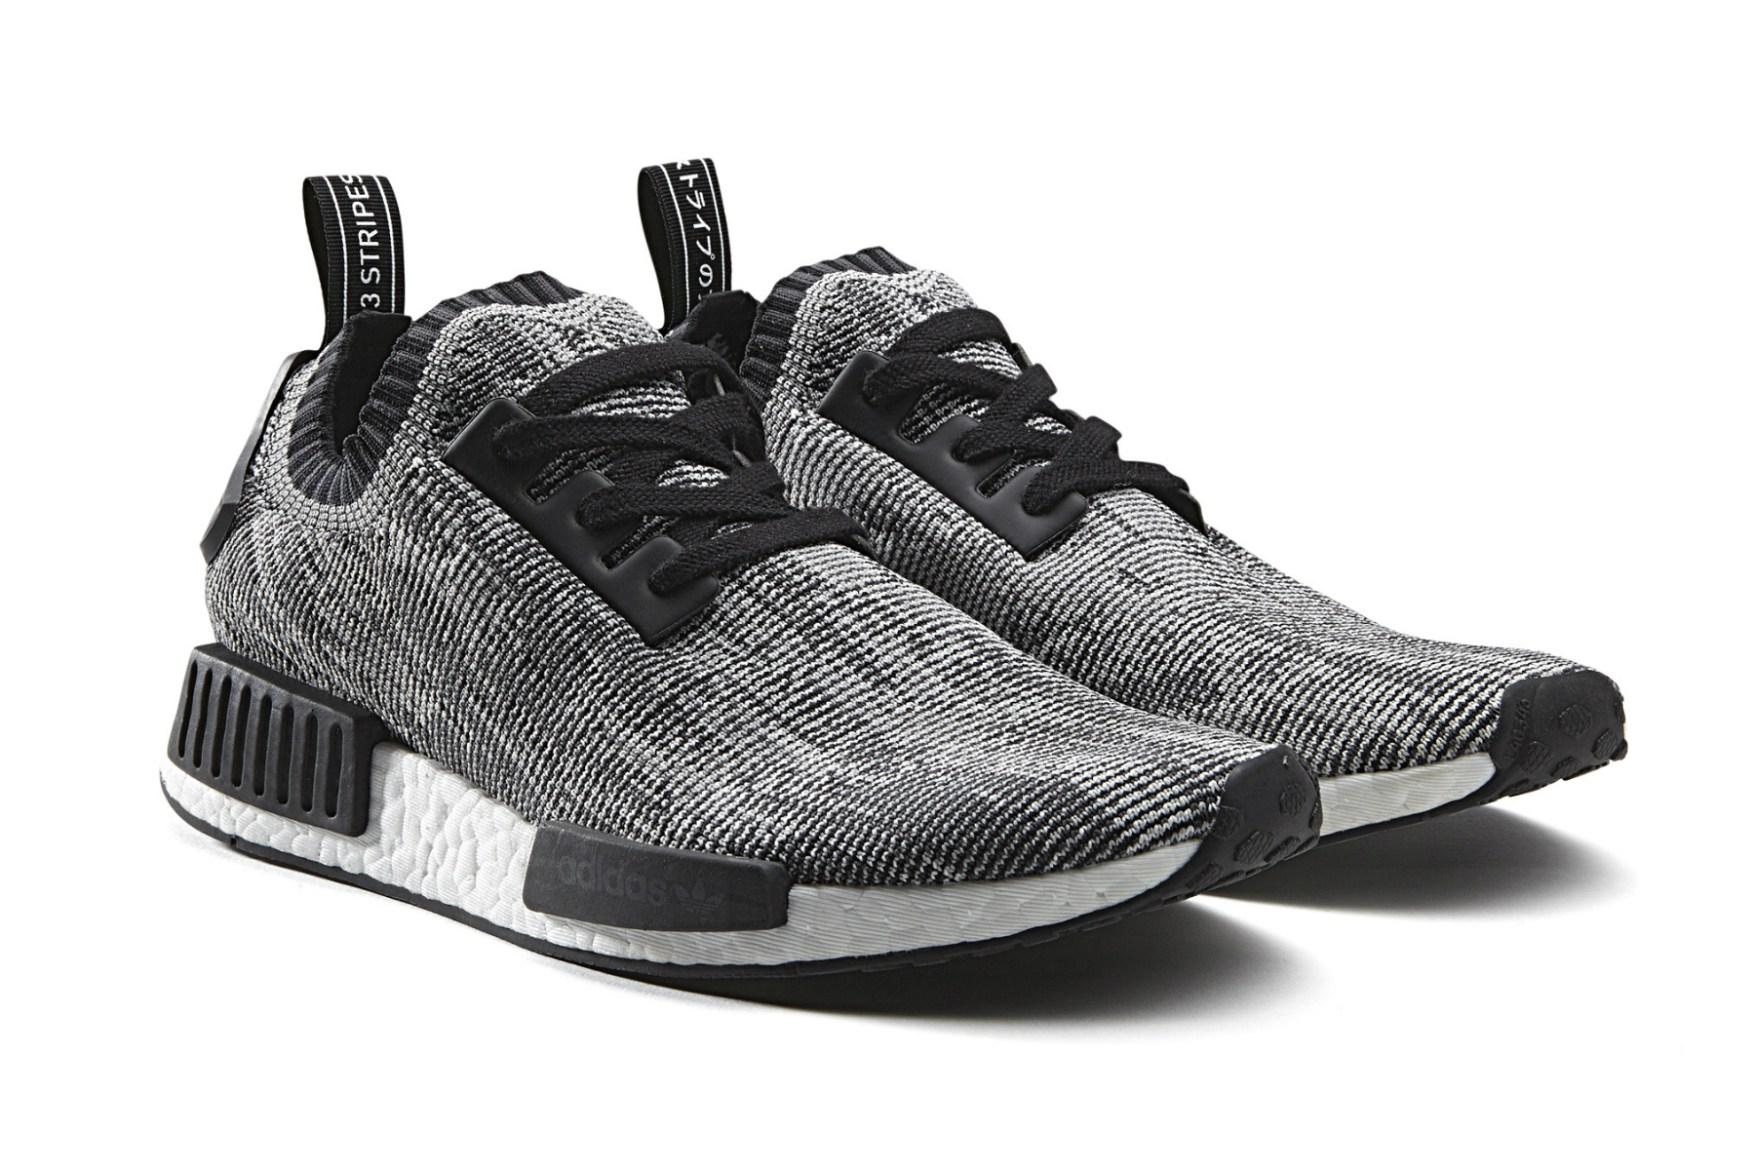 Primeknit Adidas